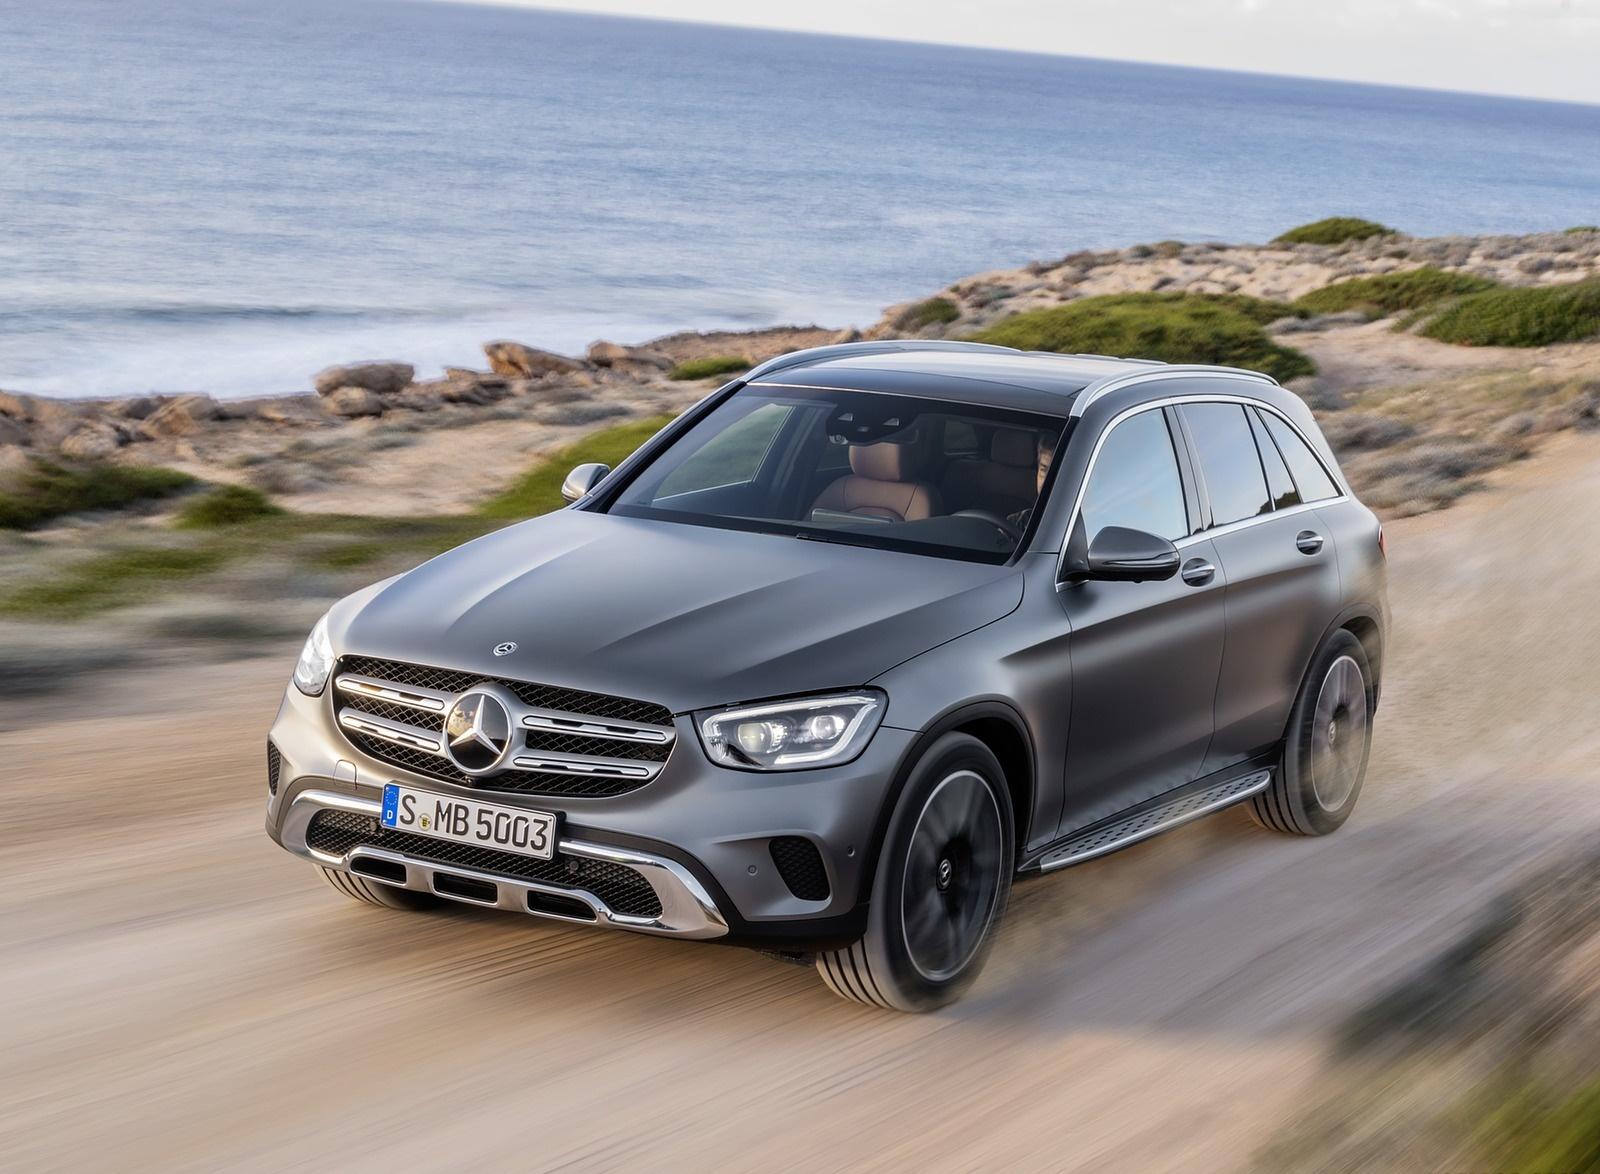 2020 Mercedes-Benz GLC (Color: Designo Selenite Grey Magno) Front Three-Quarter Wallpapers (7)